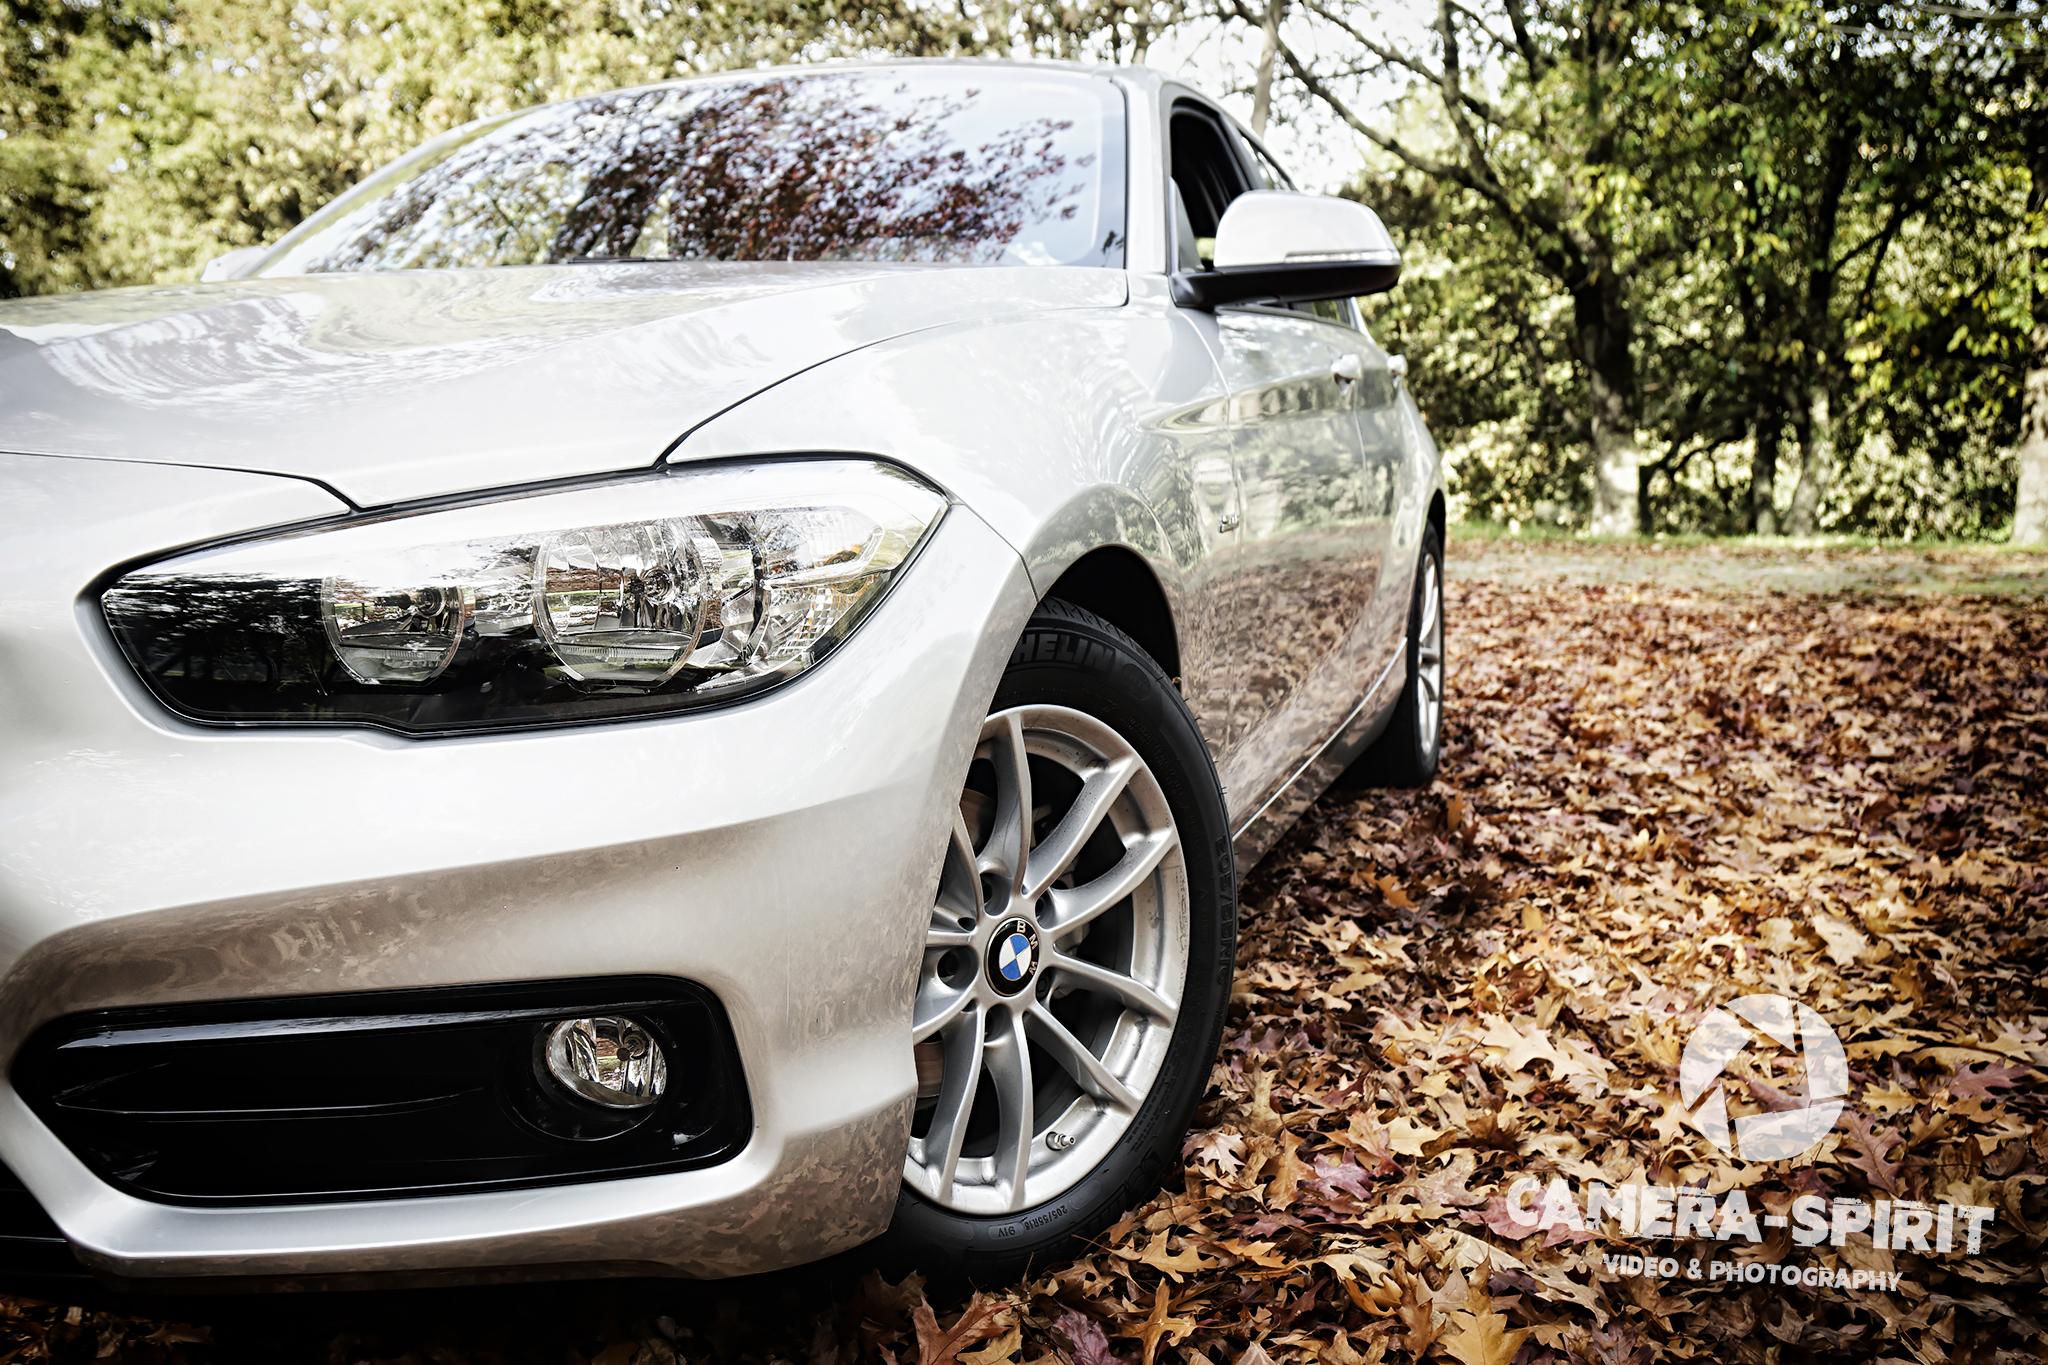 BMW_StandAutoLux_02_PL